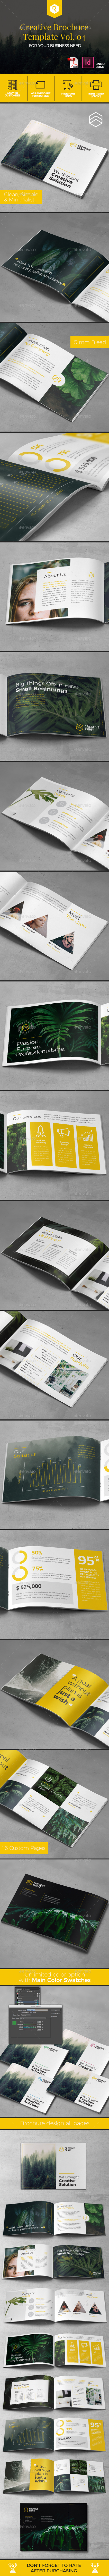 A5 Creative Brochure Template Vol. 04 - Corporate Brochures